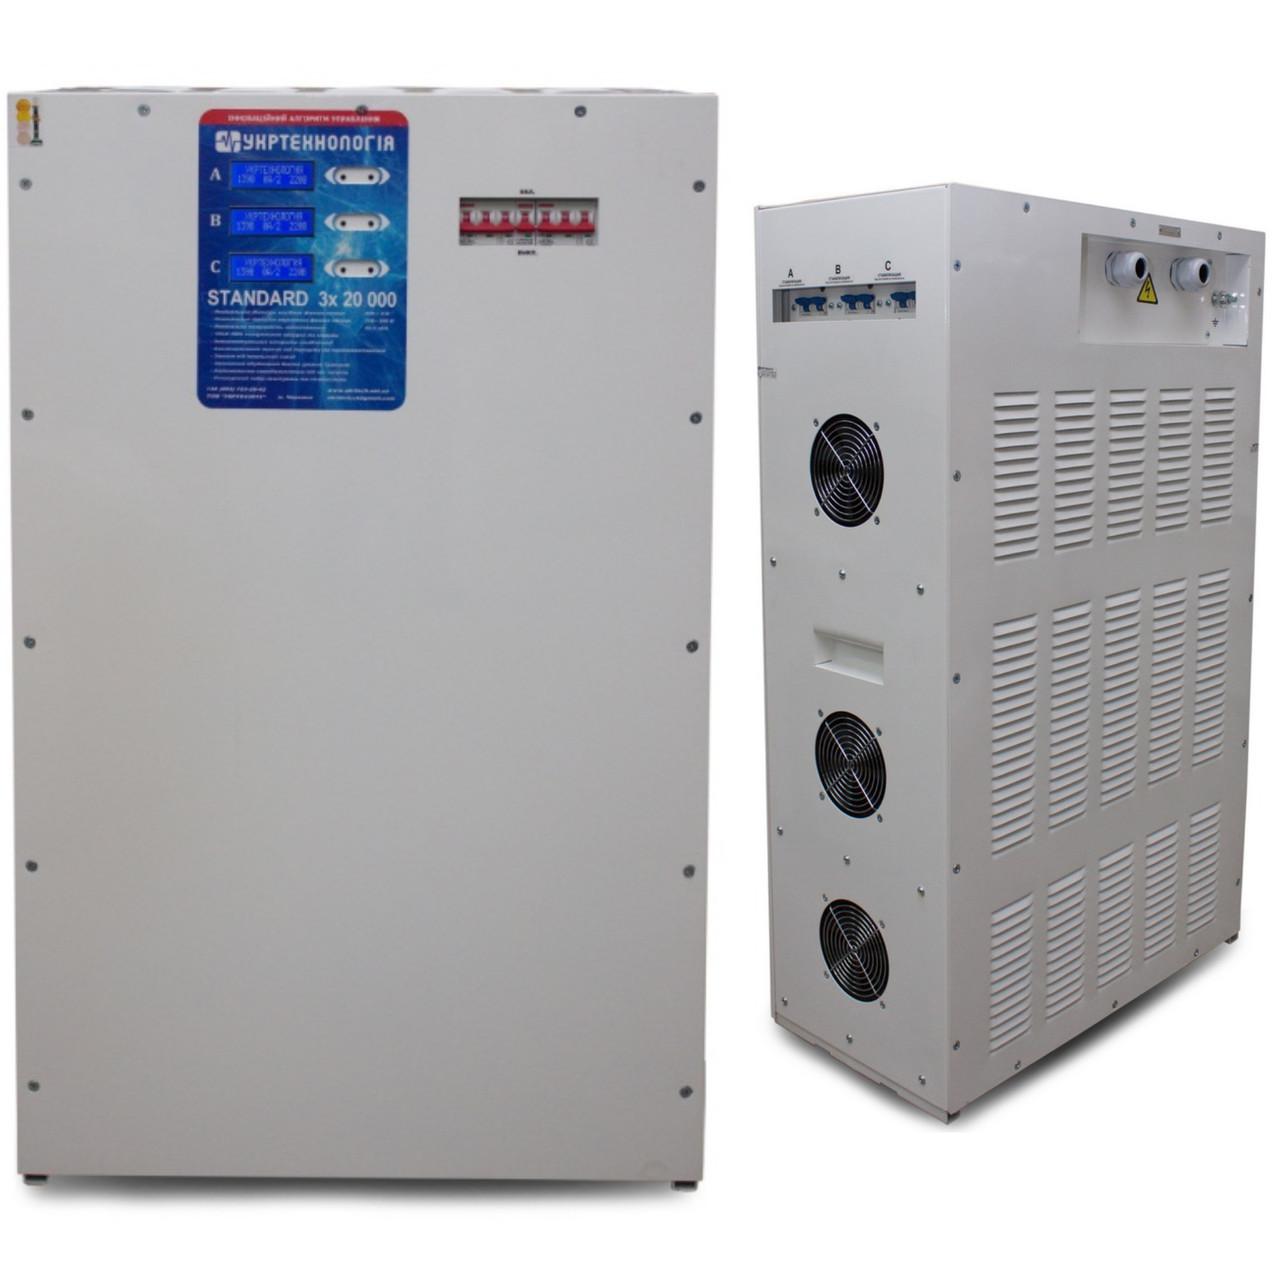 Стабилизатор напряжения Укртехнология HCH 3x7500 Universal 22,5 кВт